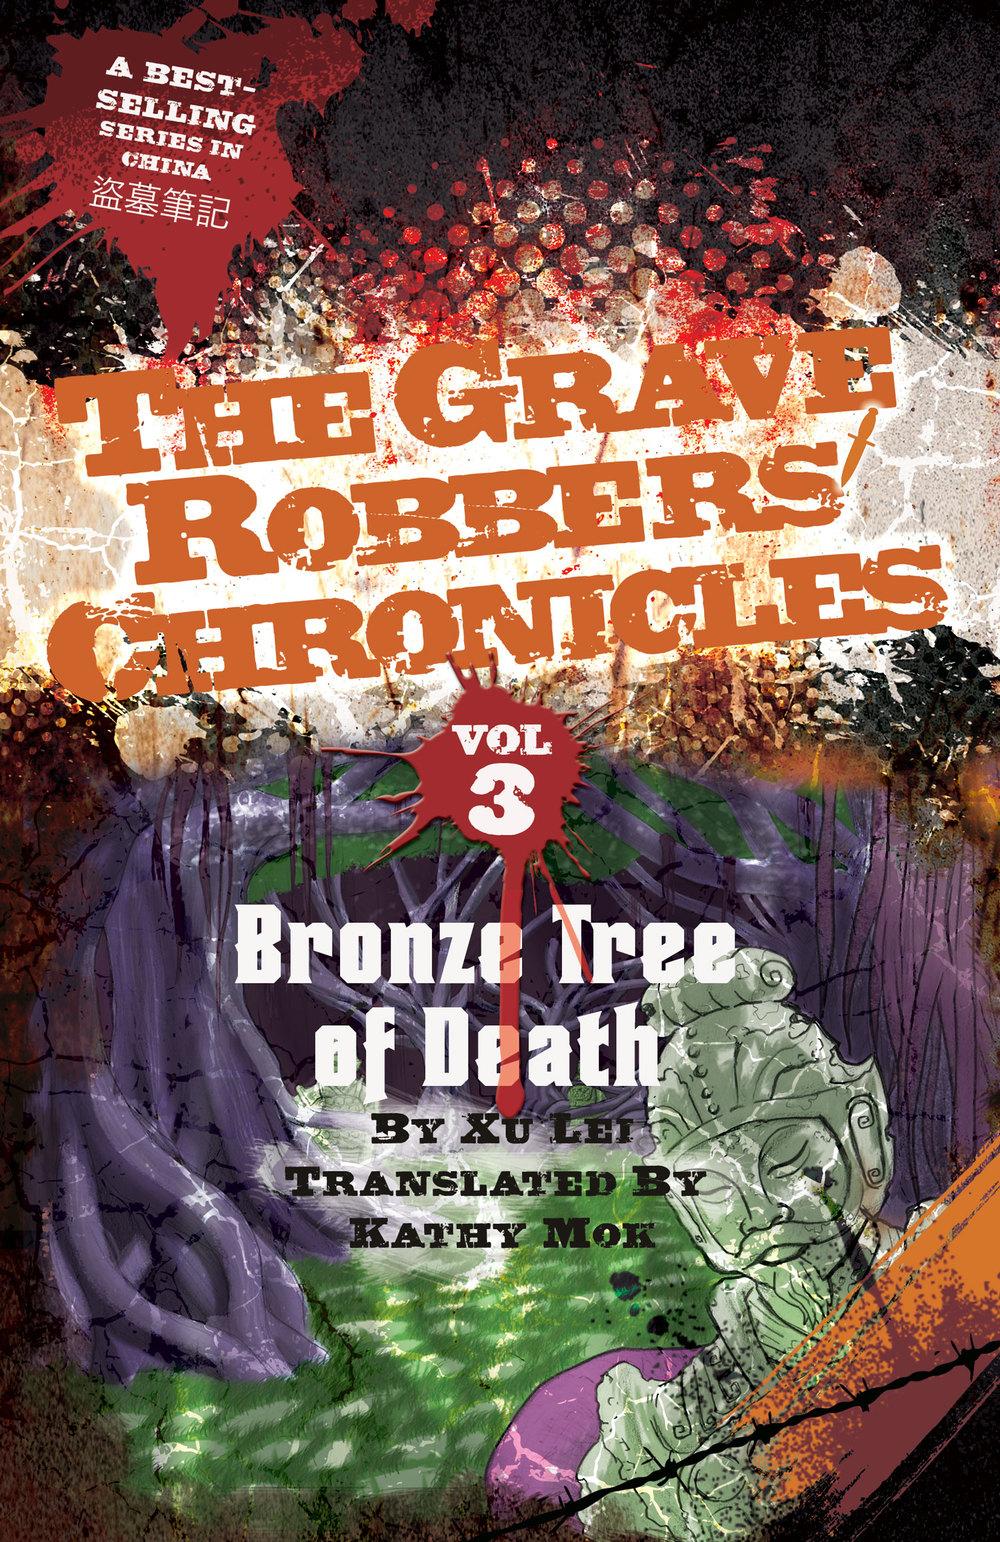 Vol. 3: Bronze Tree of Death